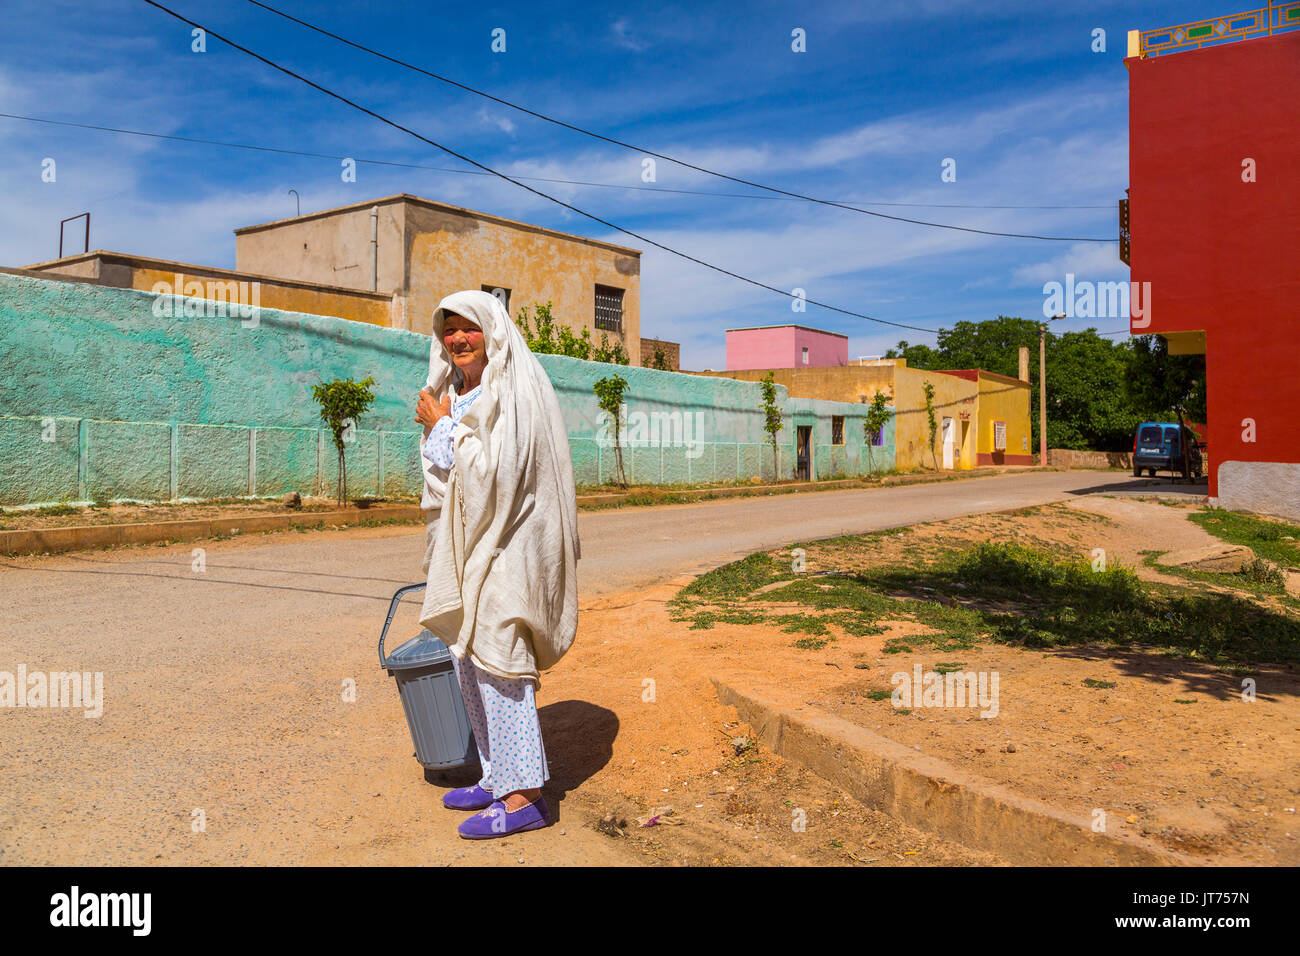 Bhalil, femme en robe blanche qui couvre sa tête. Le Maroc, Maghreb, Afrique du Nord Photo Stock